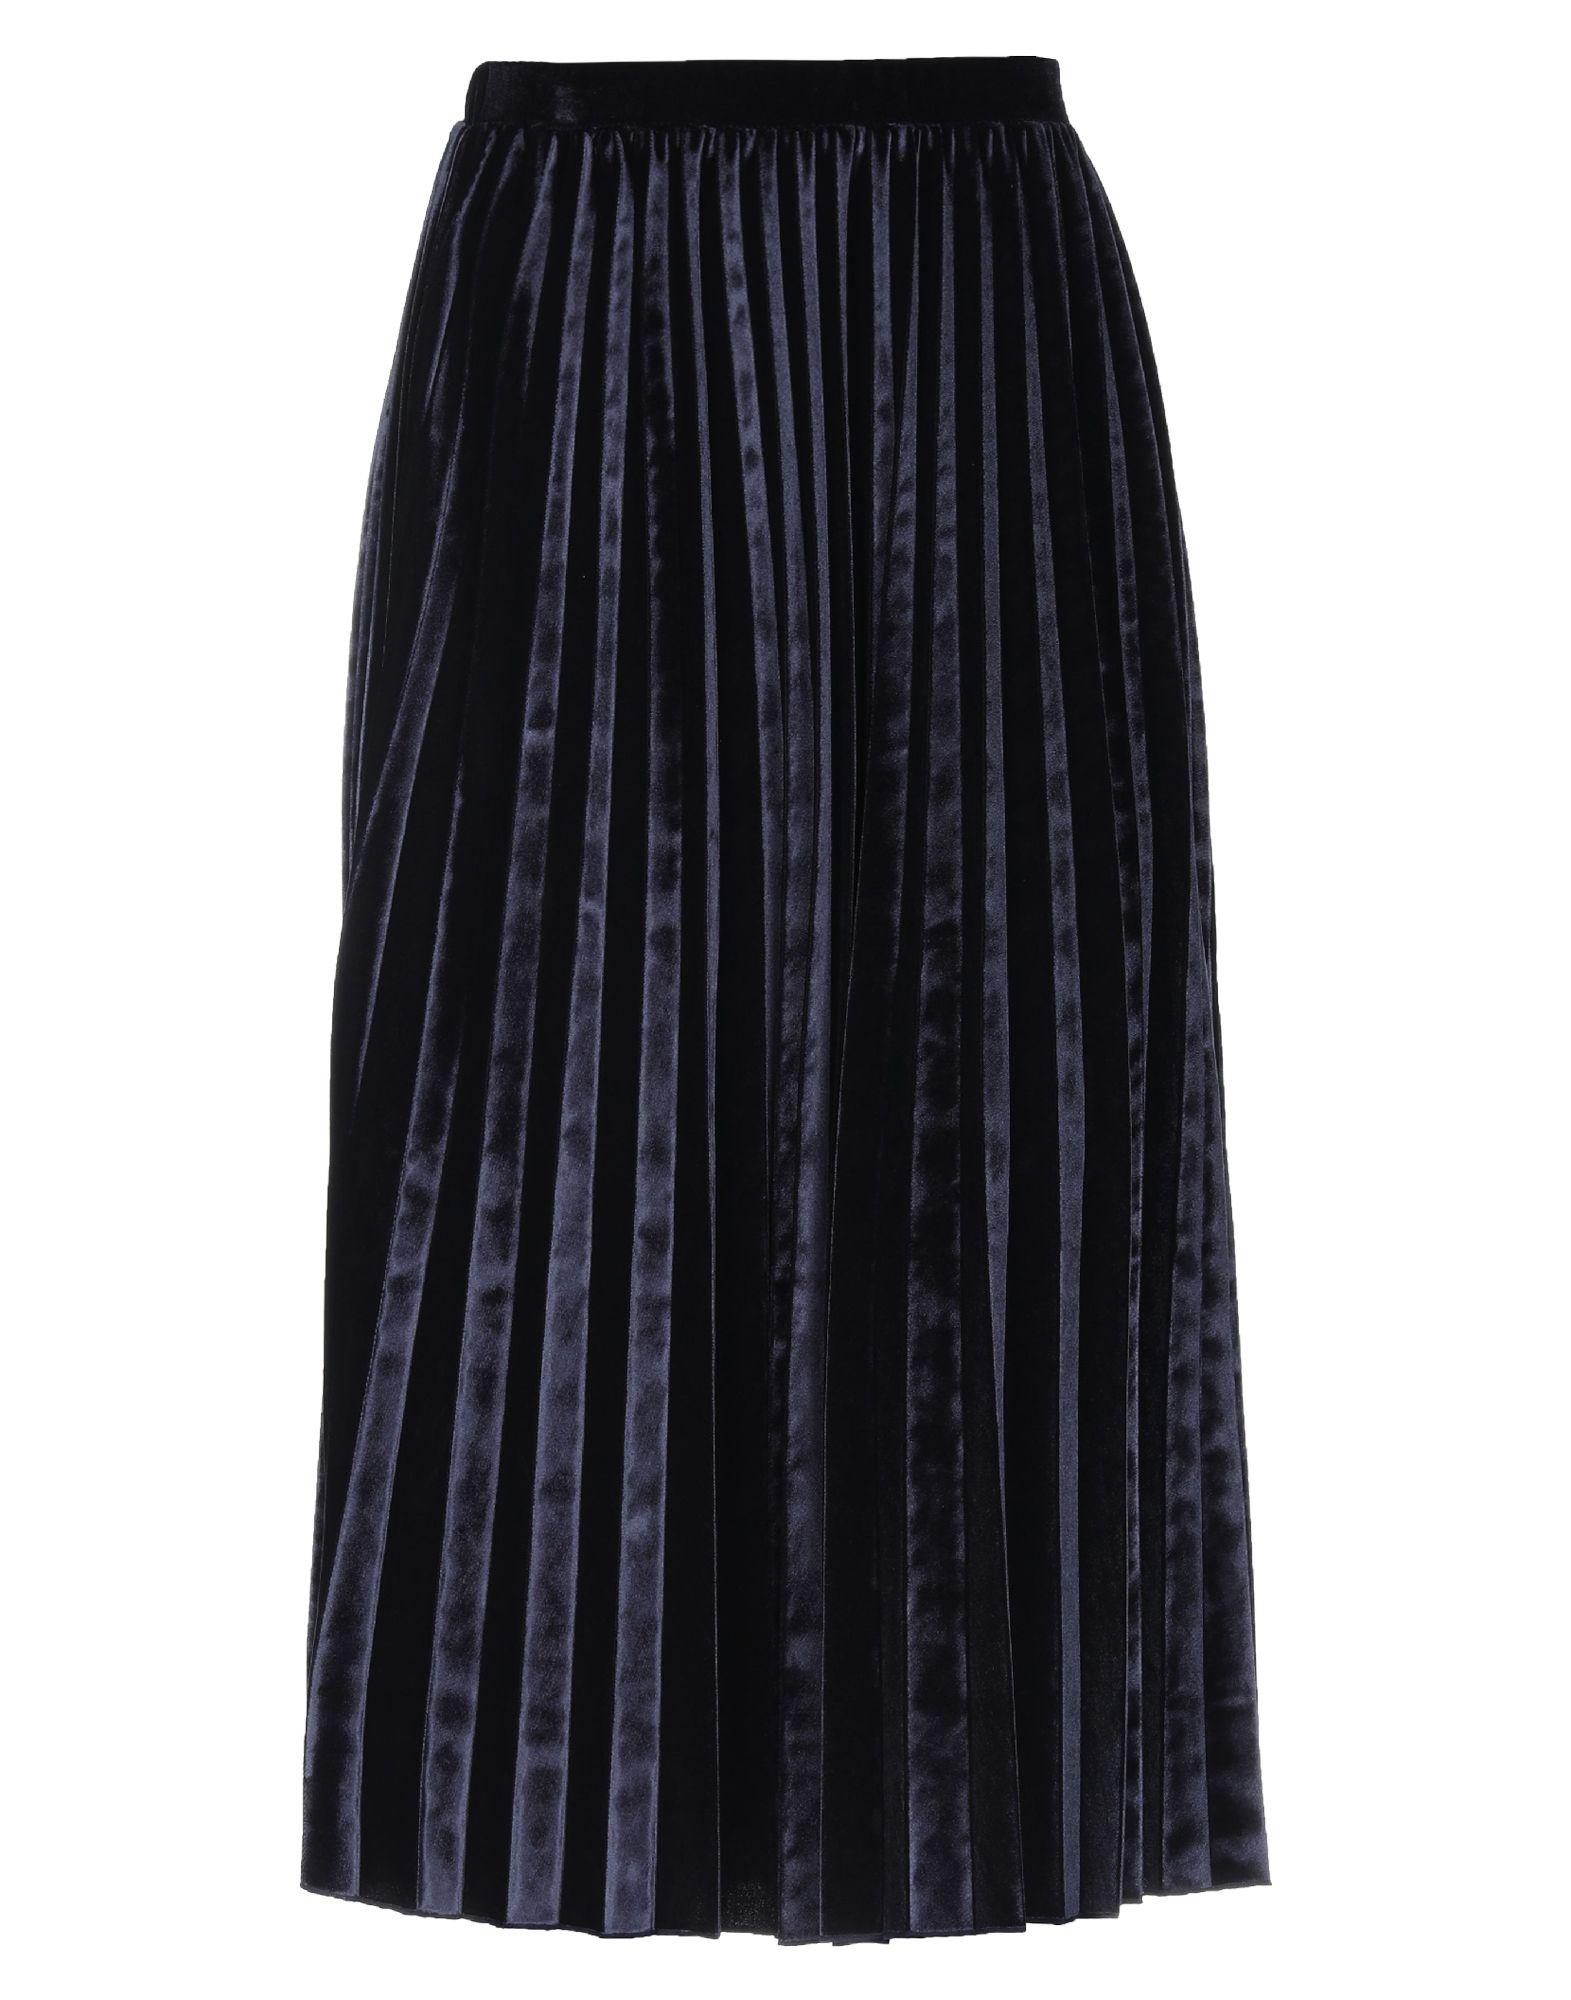 MAX & CO. Юбка длиной 3/4 max mara юбка длиной 3 4